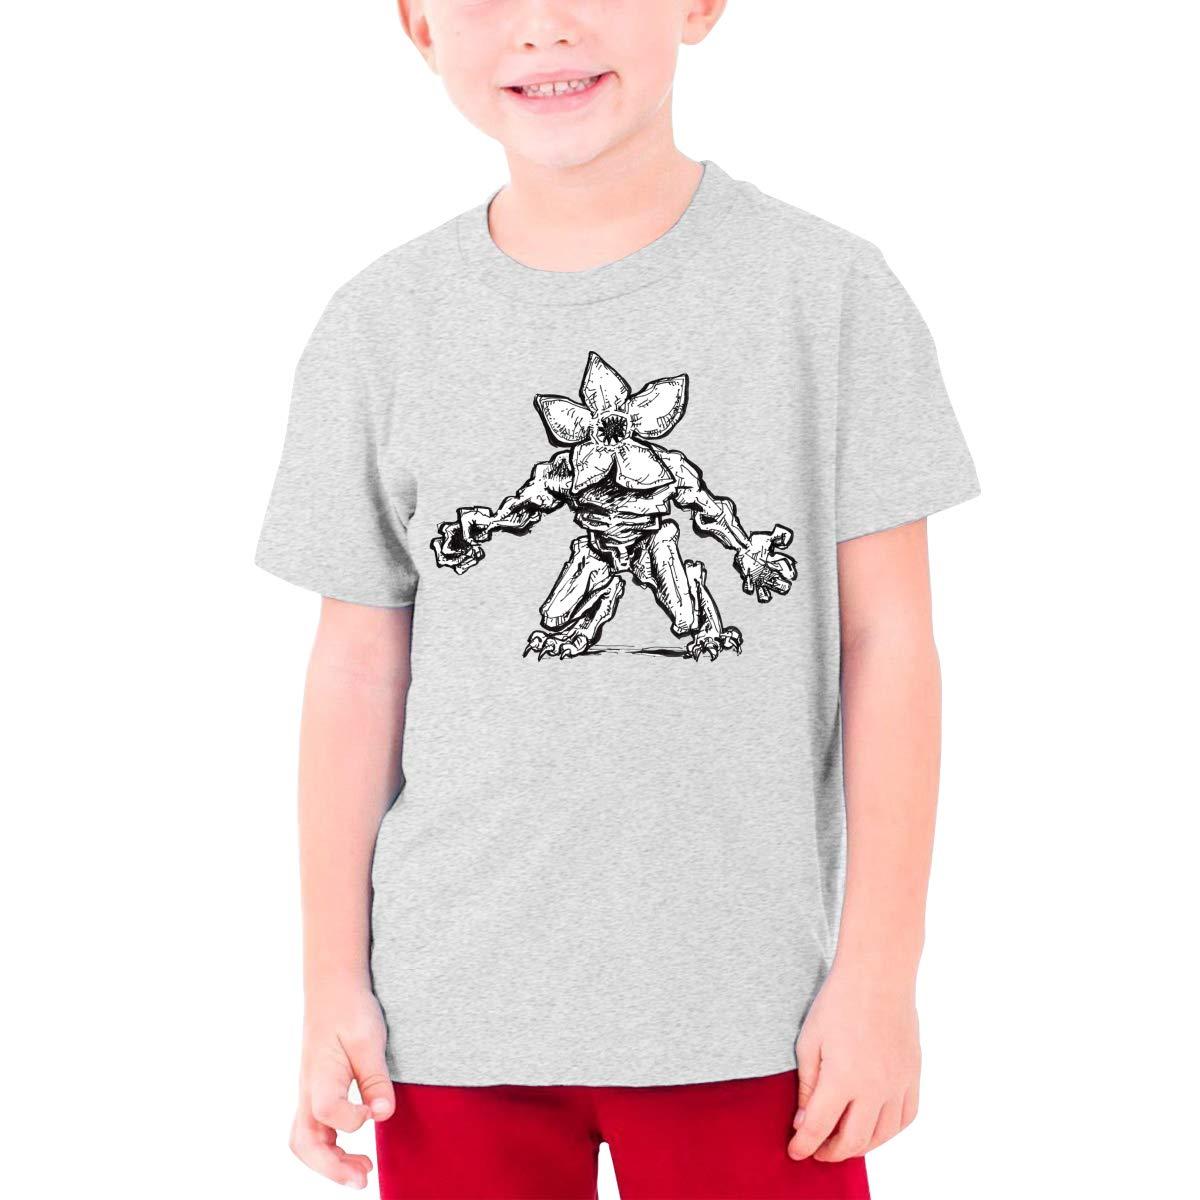 S-S-Stranger Thing-s Fan Short-Sleeve Tops Children Tee Teenage Halloween Tshirt for Boy Girl Black Magicuas Kid T Shirt